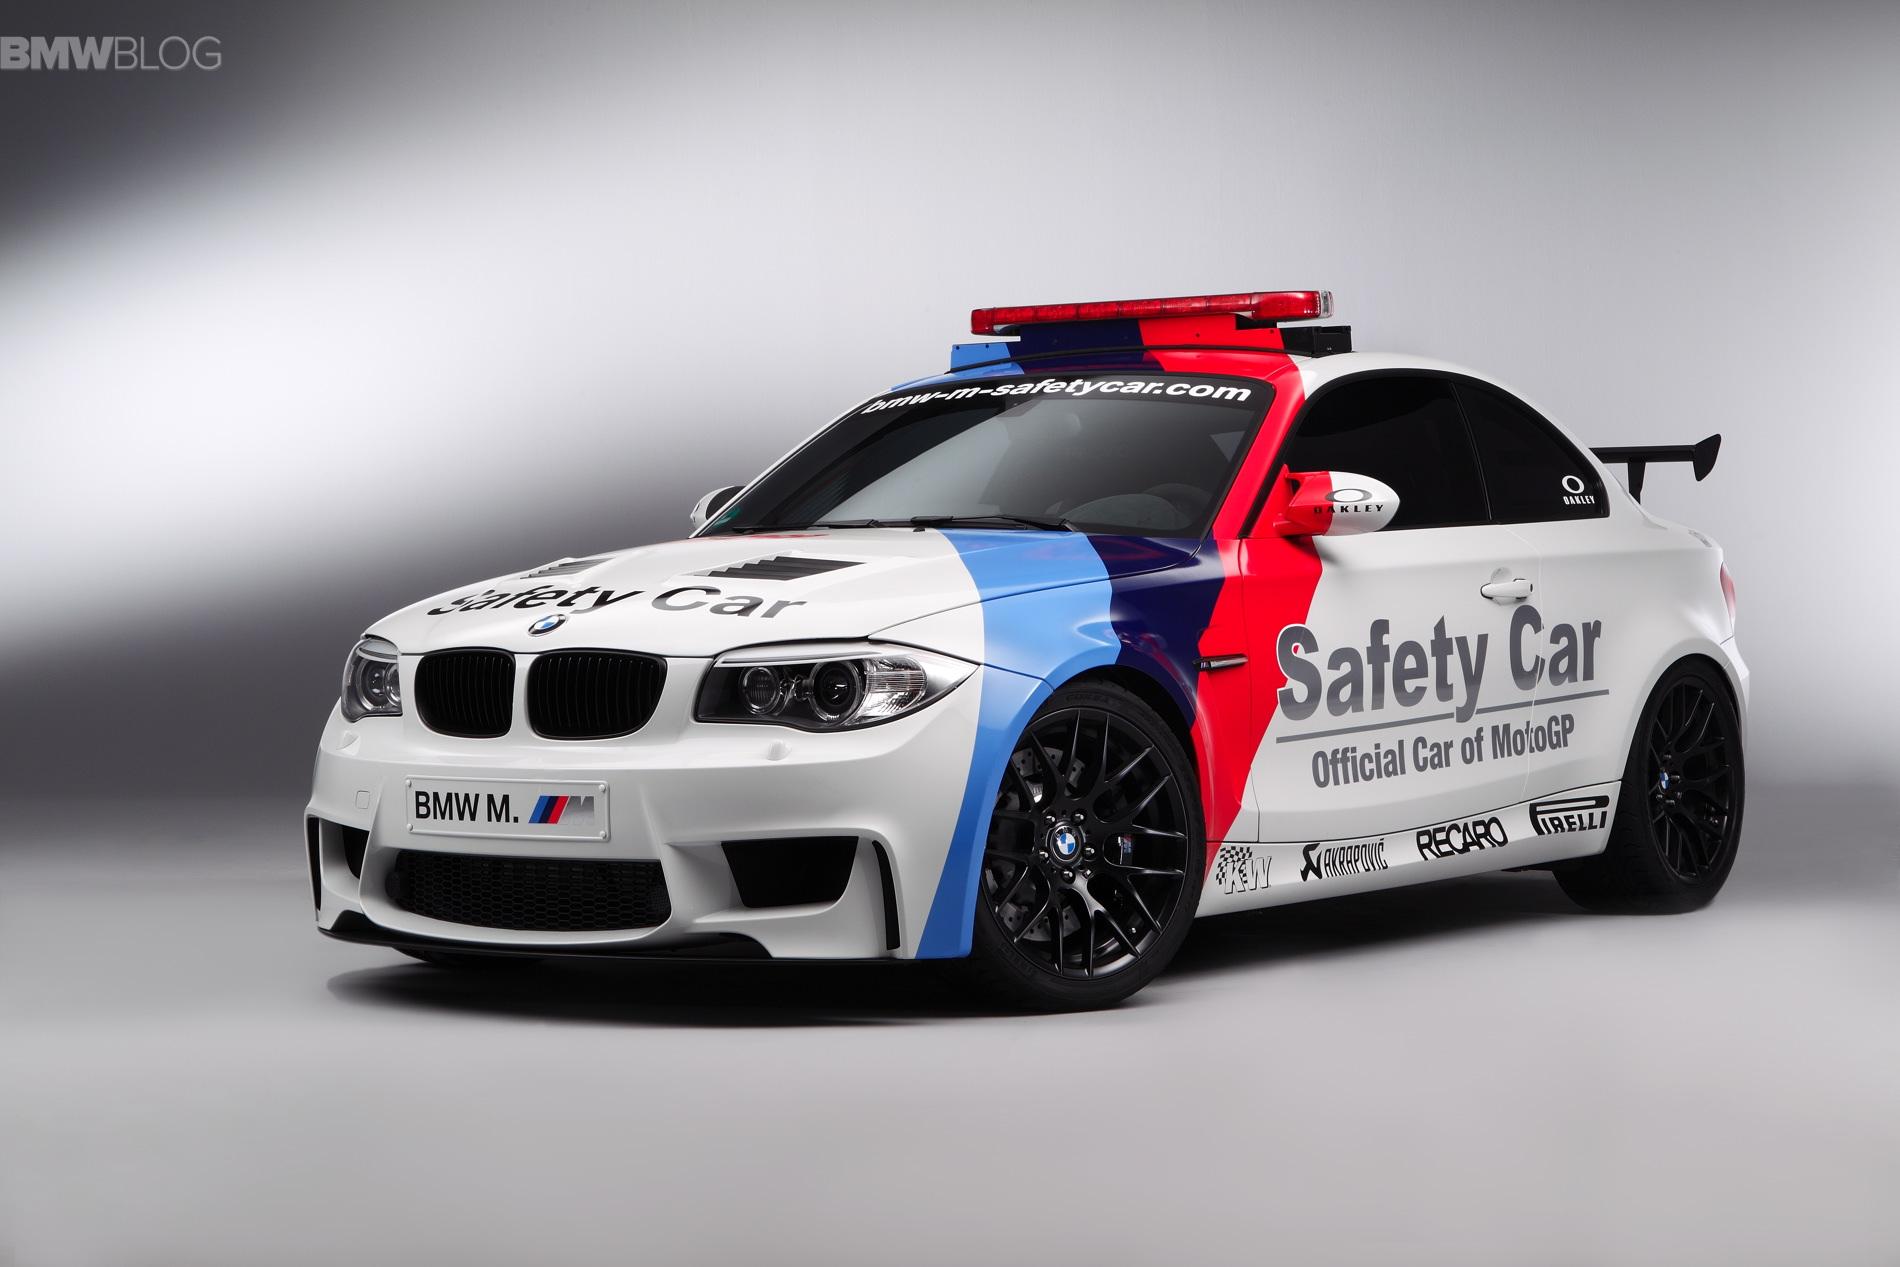 bmw 1m safety car akrapovic images 18